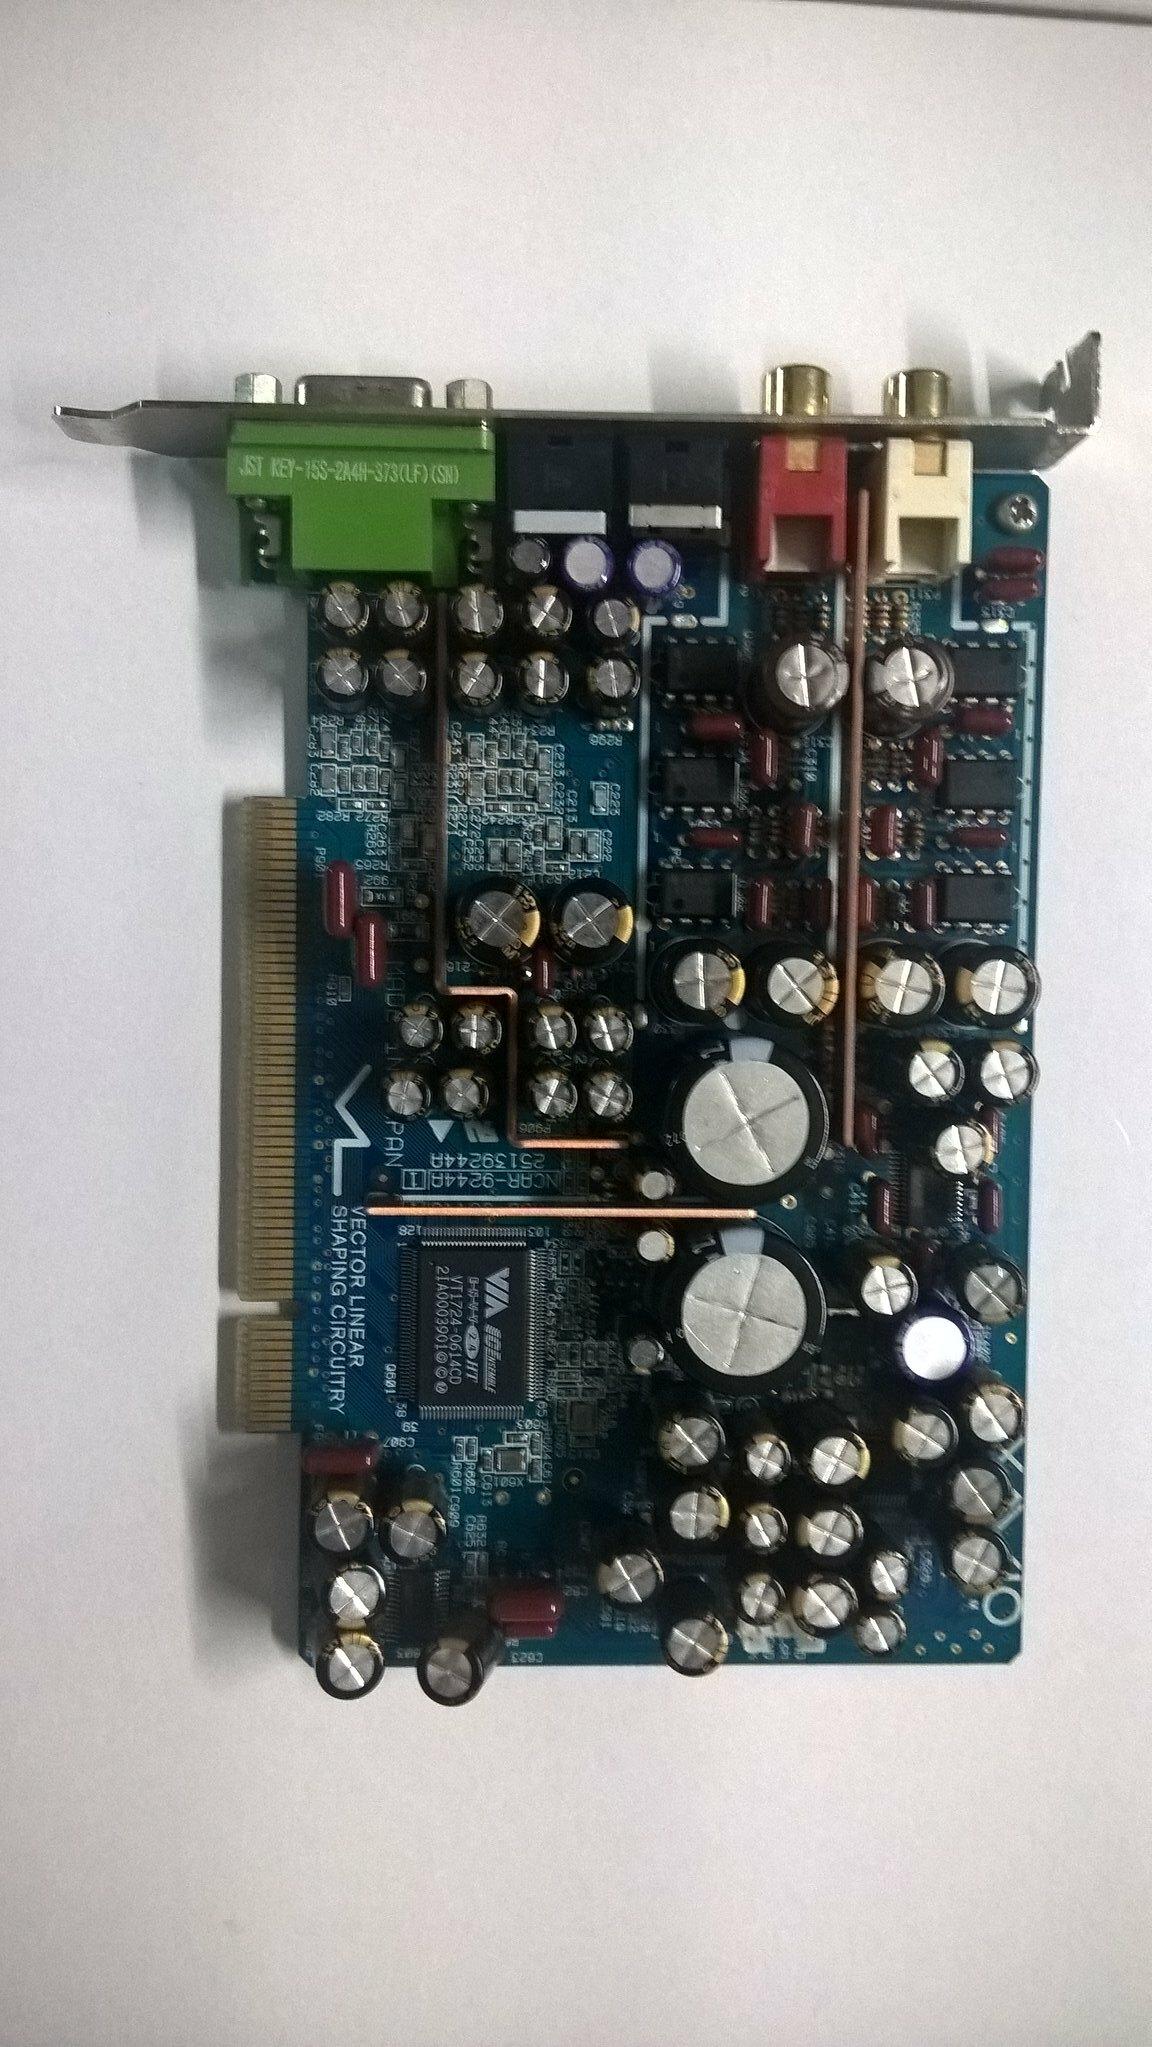 Onkyo từ Japan - U55SX, U55SX2, 200PCI LTD, 200PCI, 150PCI, 90PCI - 7